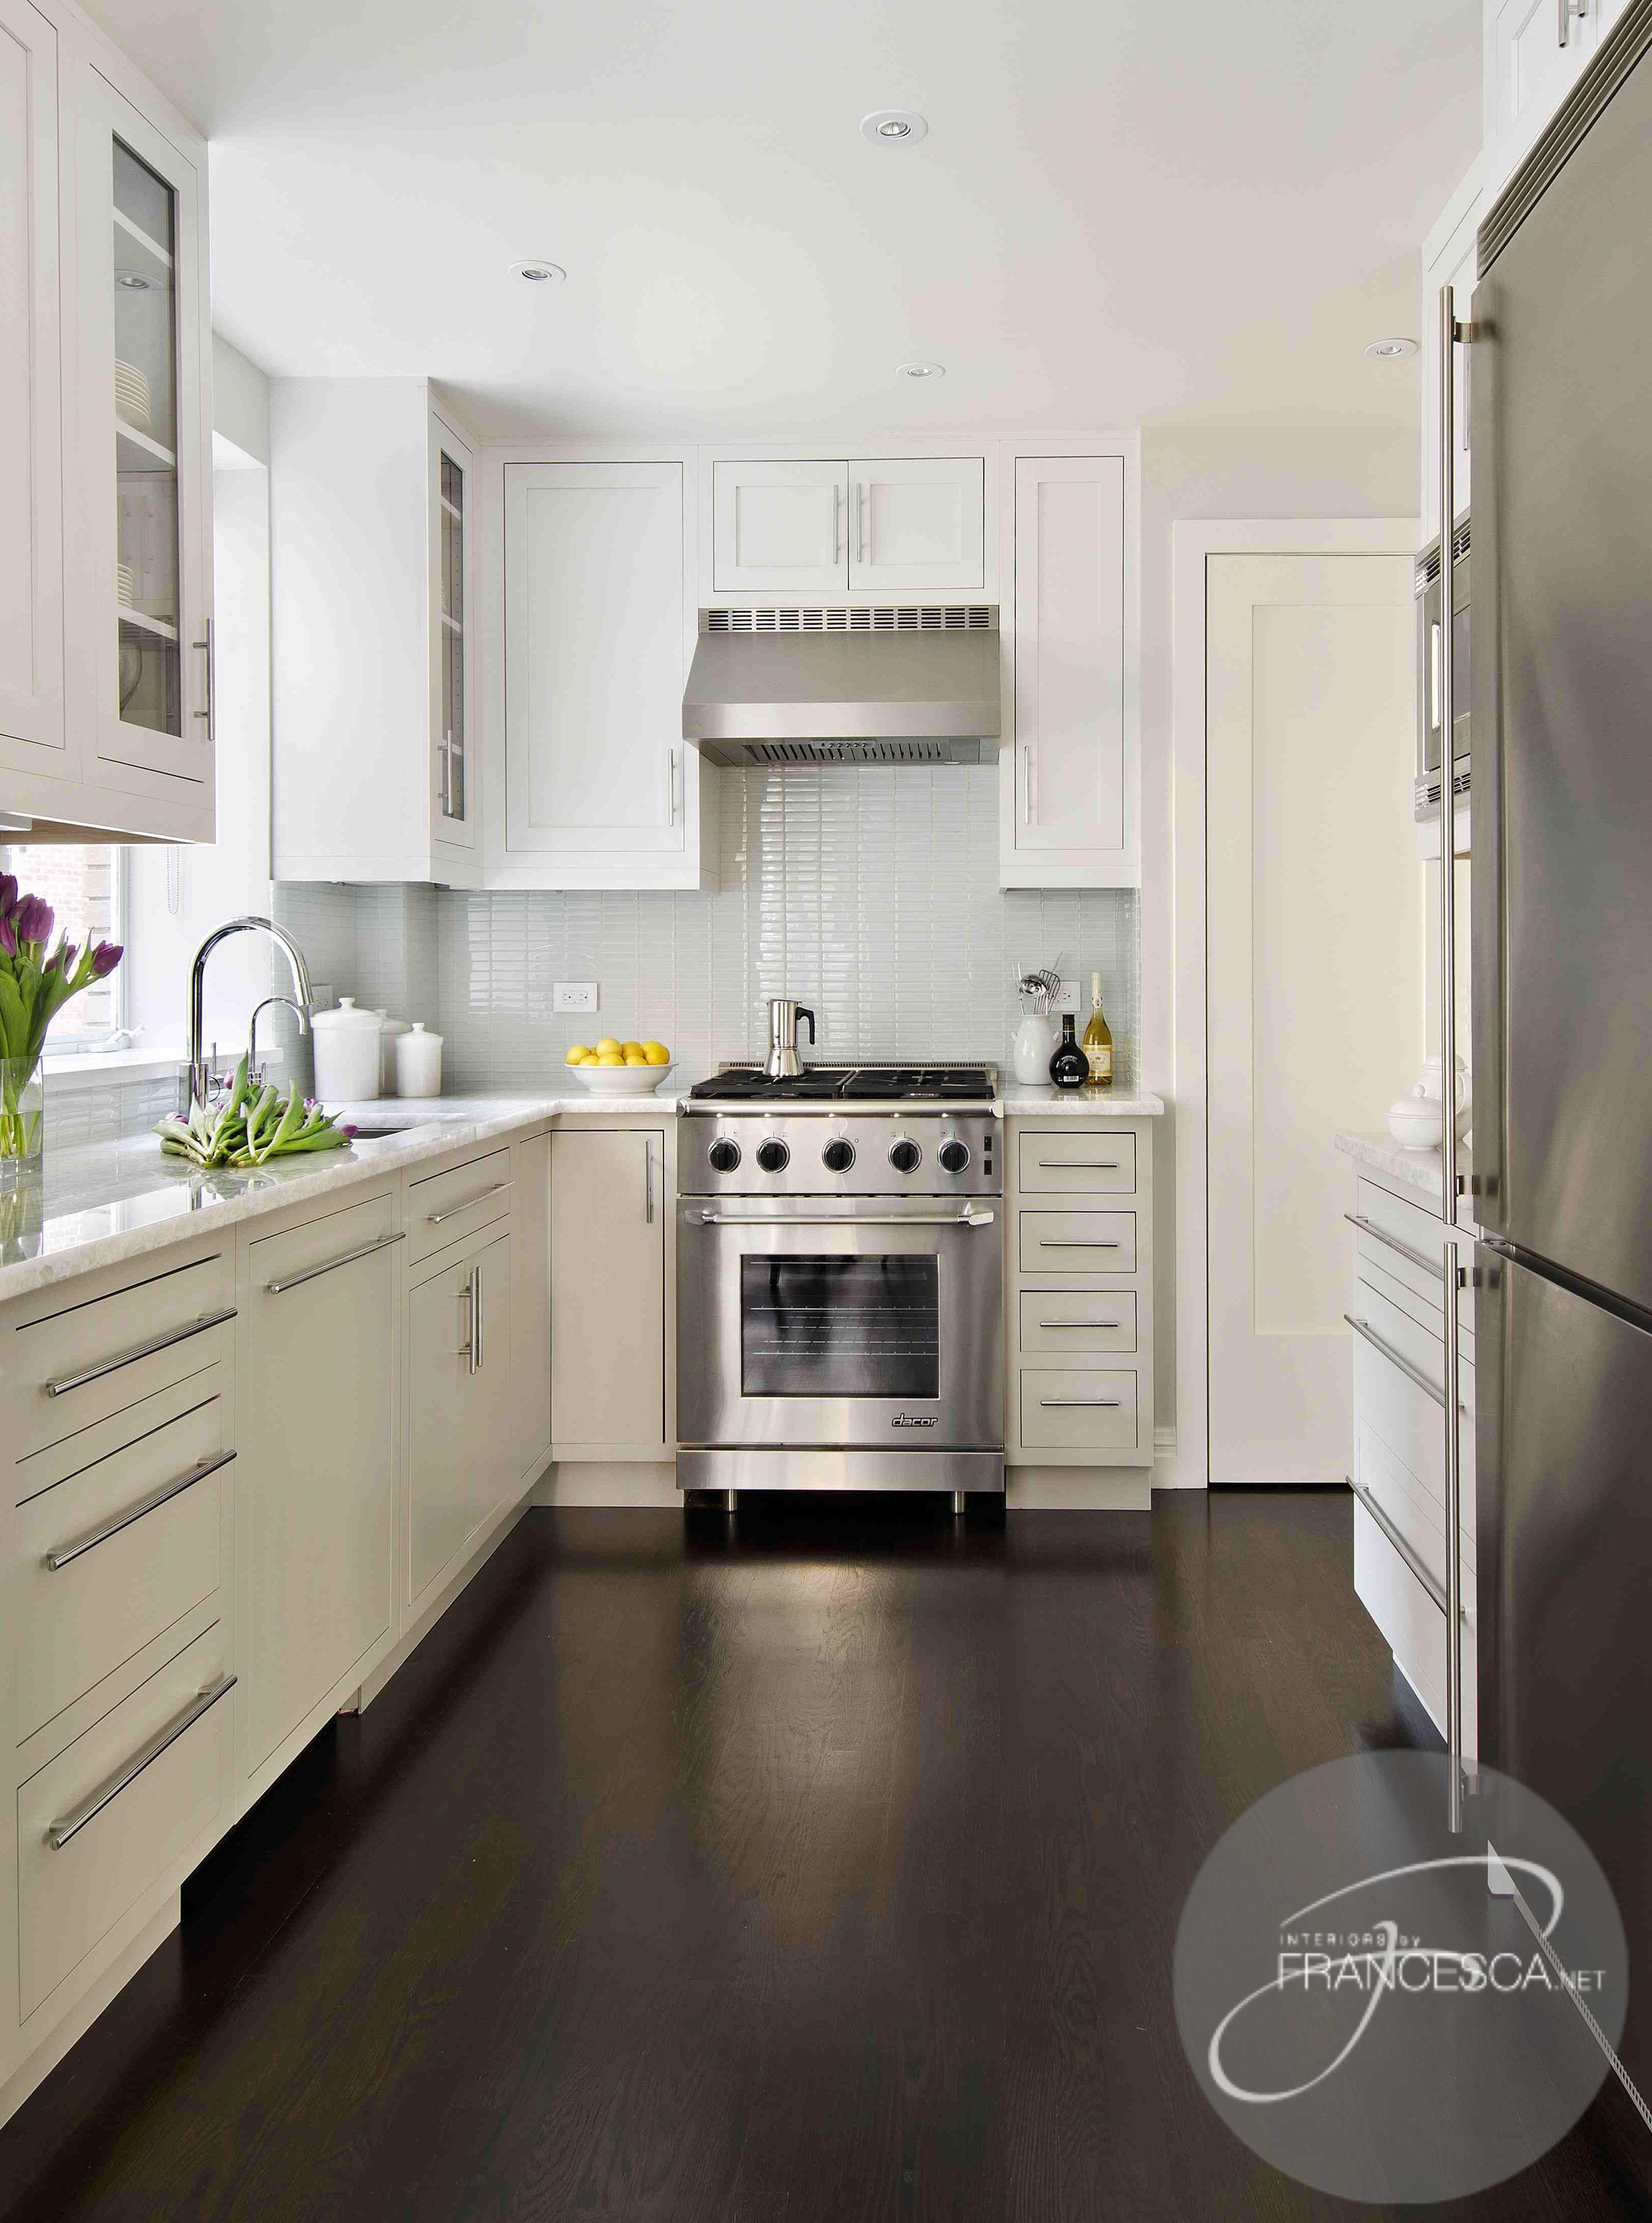 chic nyc kitchen modern classic kitchen interior design kitchen remodel small white kitchen on kitchen interior classic id=95548